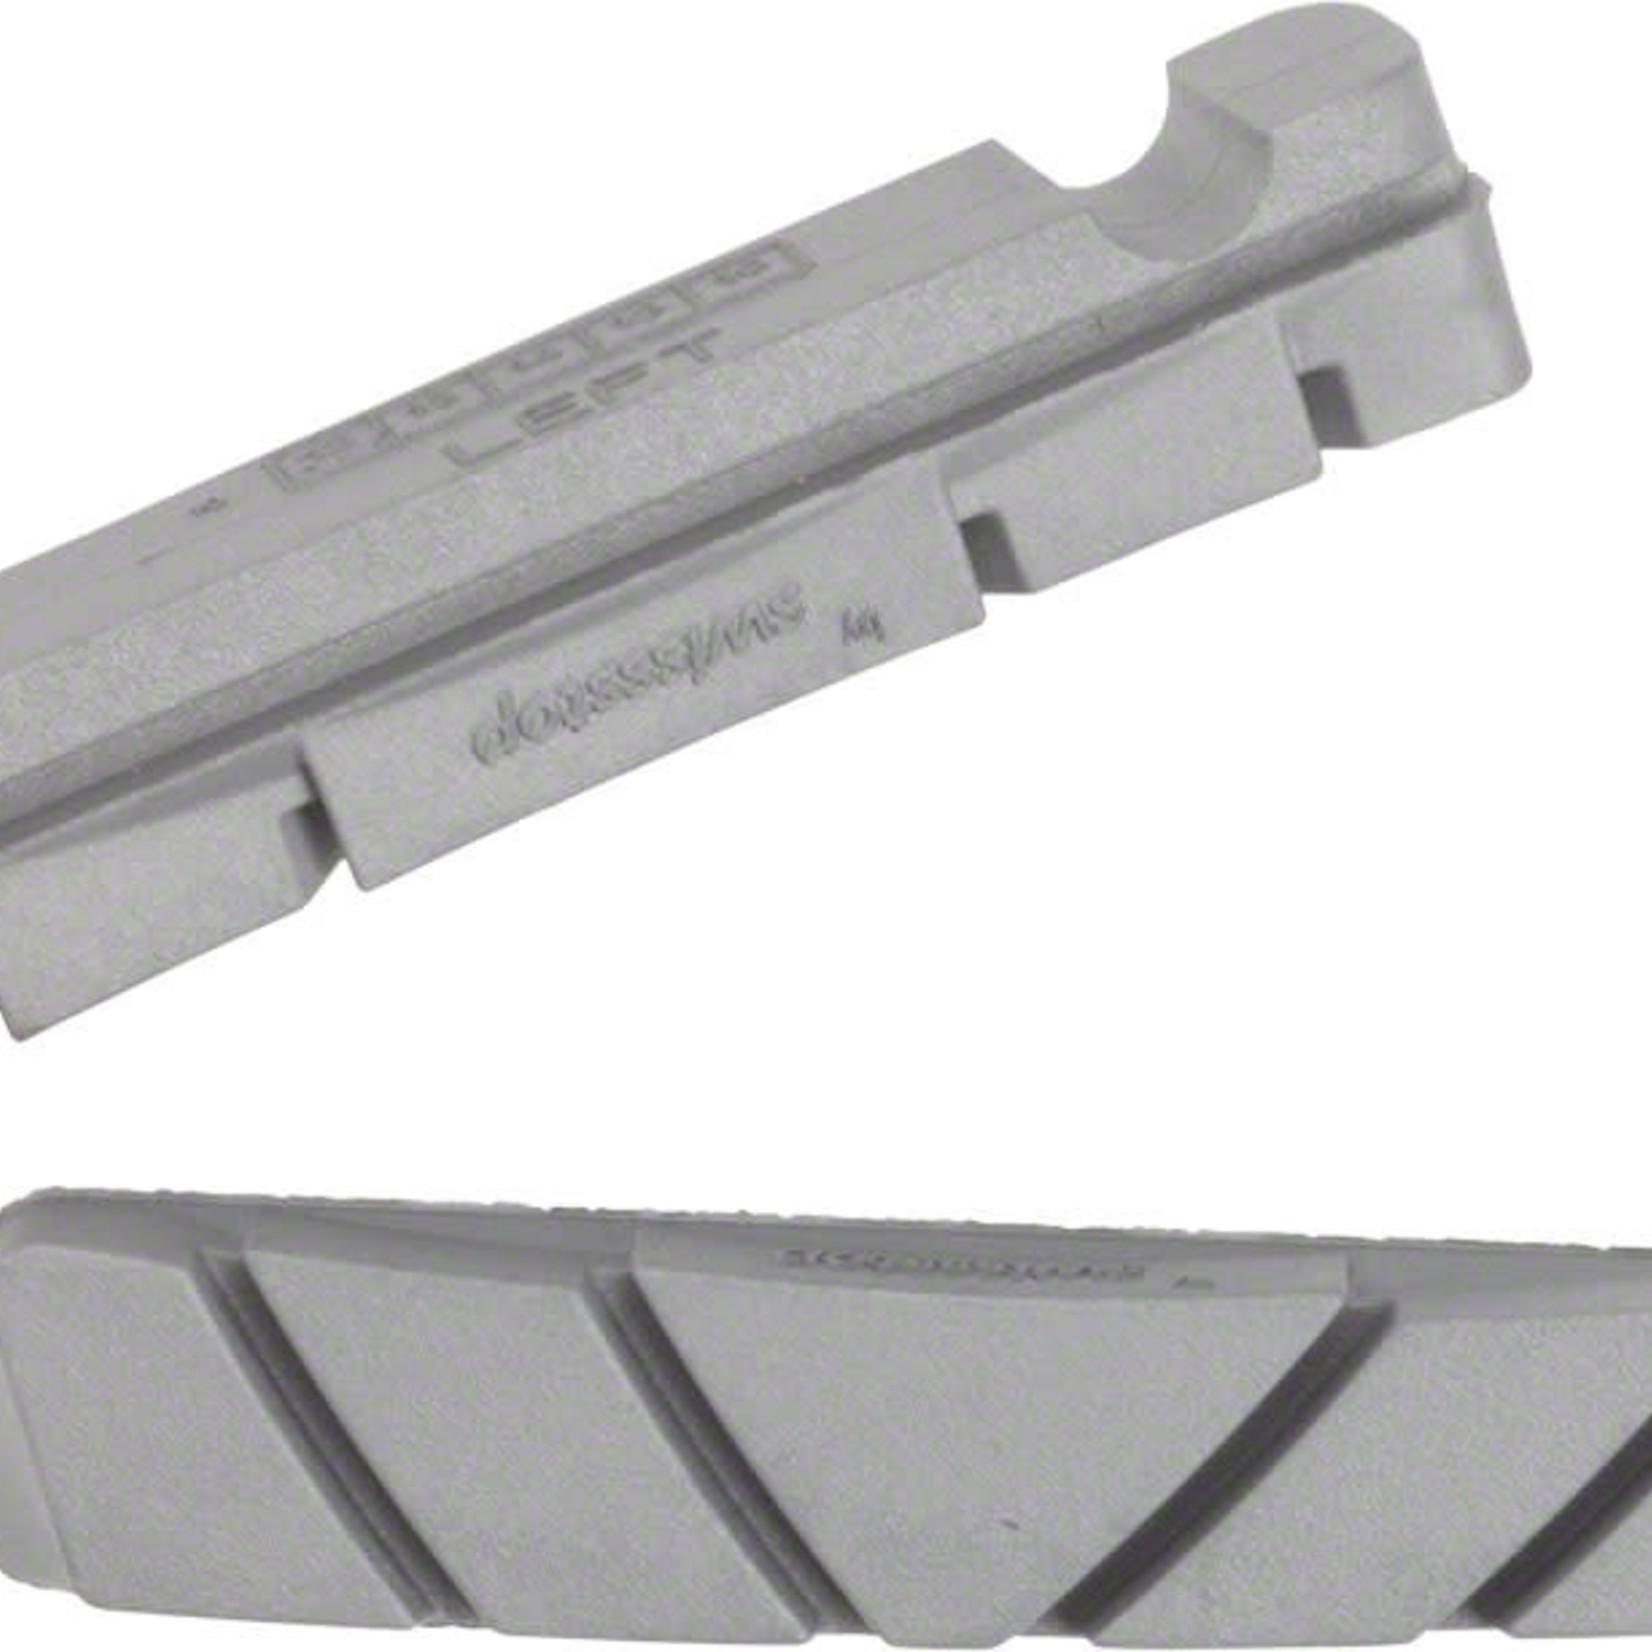 Zipp Speed Weaponry Zipp Speed Weaponry Tangente Platinum Pro Evo Brake Pad Inserts for Carbon Rims, SRAM/Shimano, 1 Pair